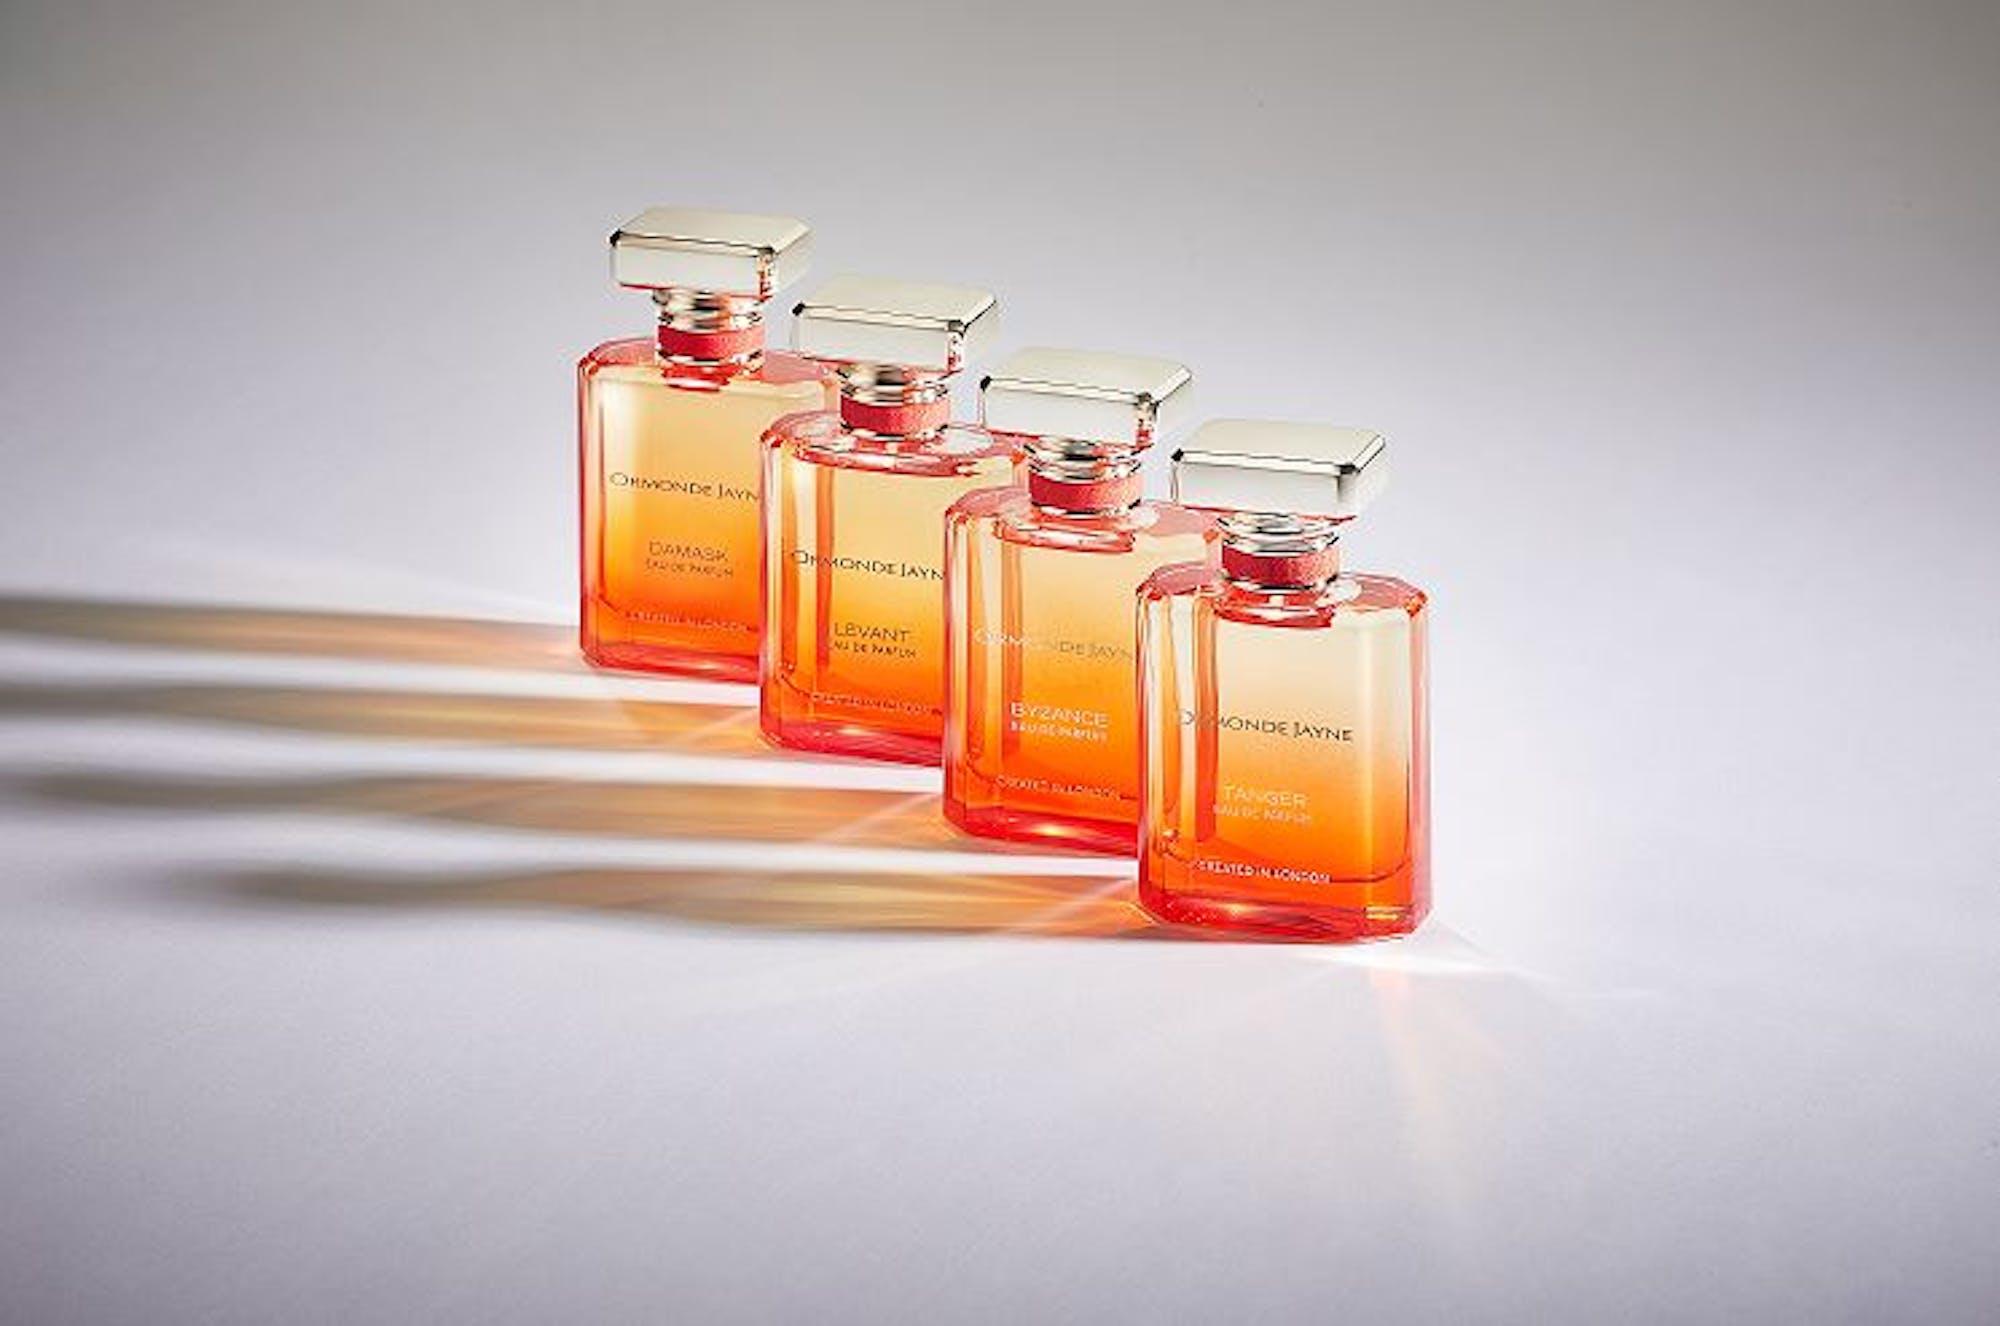 La Route de la Soie, a new collection celebrates 20 years of Ormonde Jayne perfumery